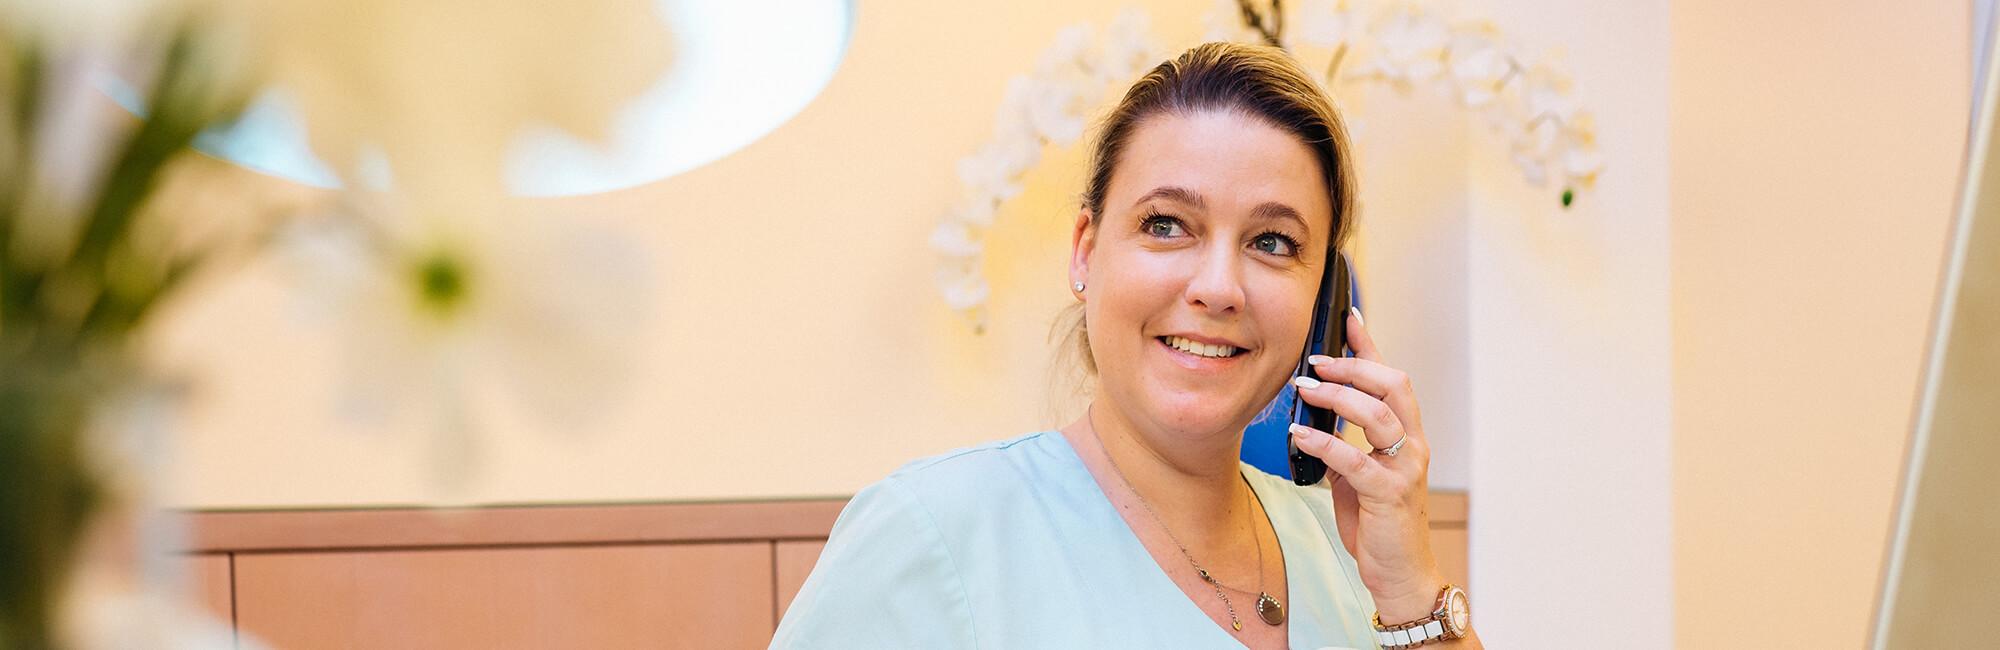 Zahnarzt Trudering - Dr. Gruber - Kontakt